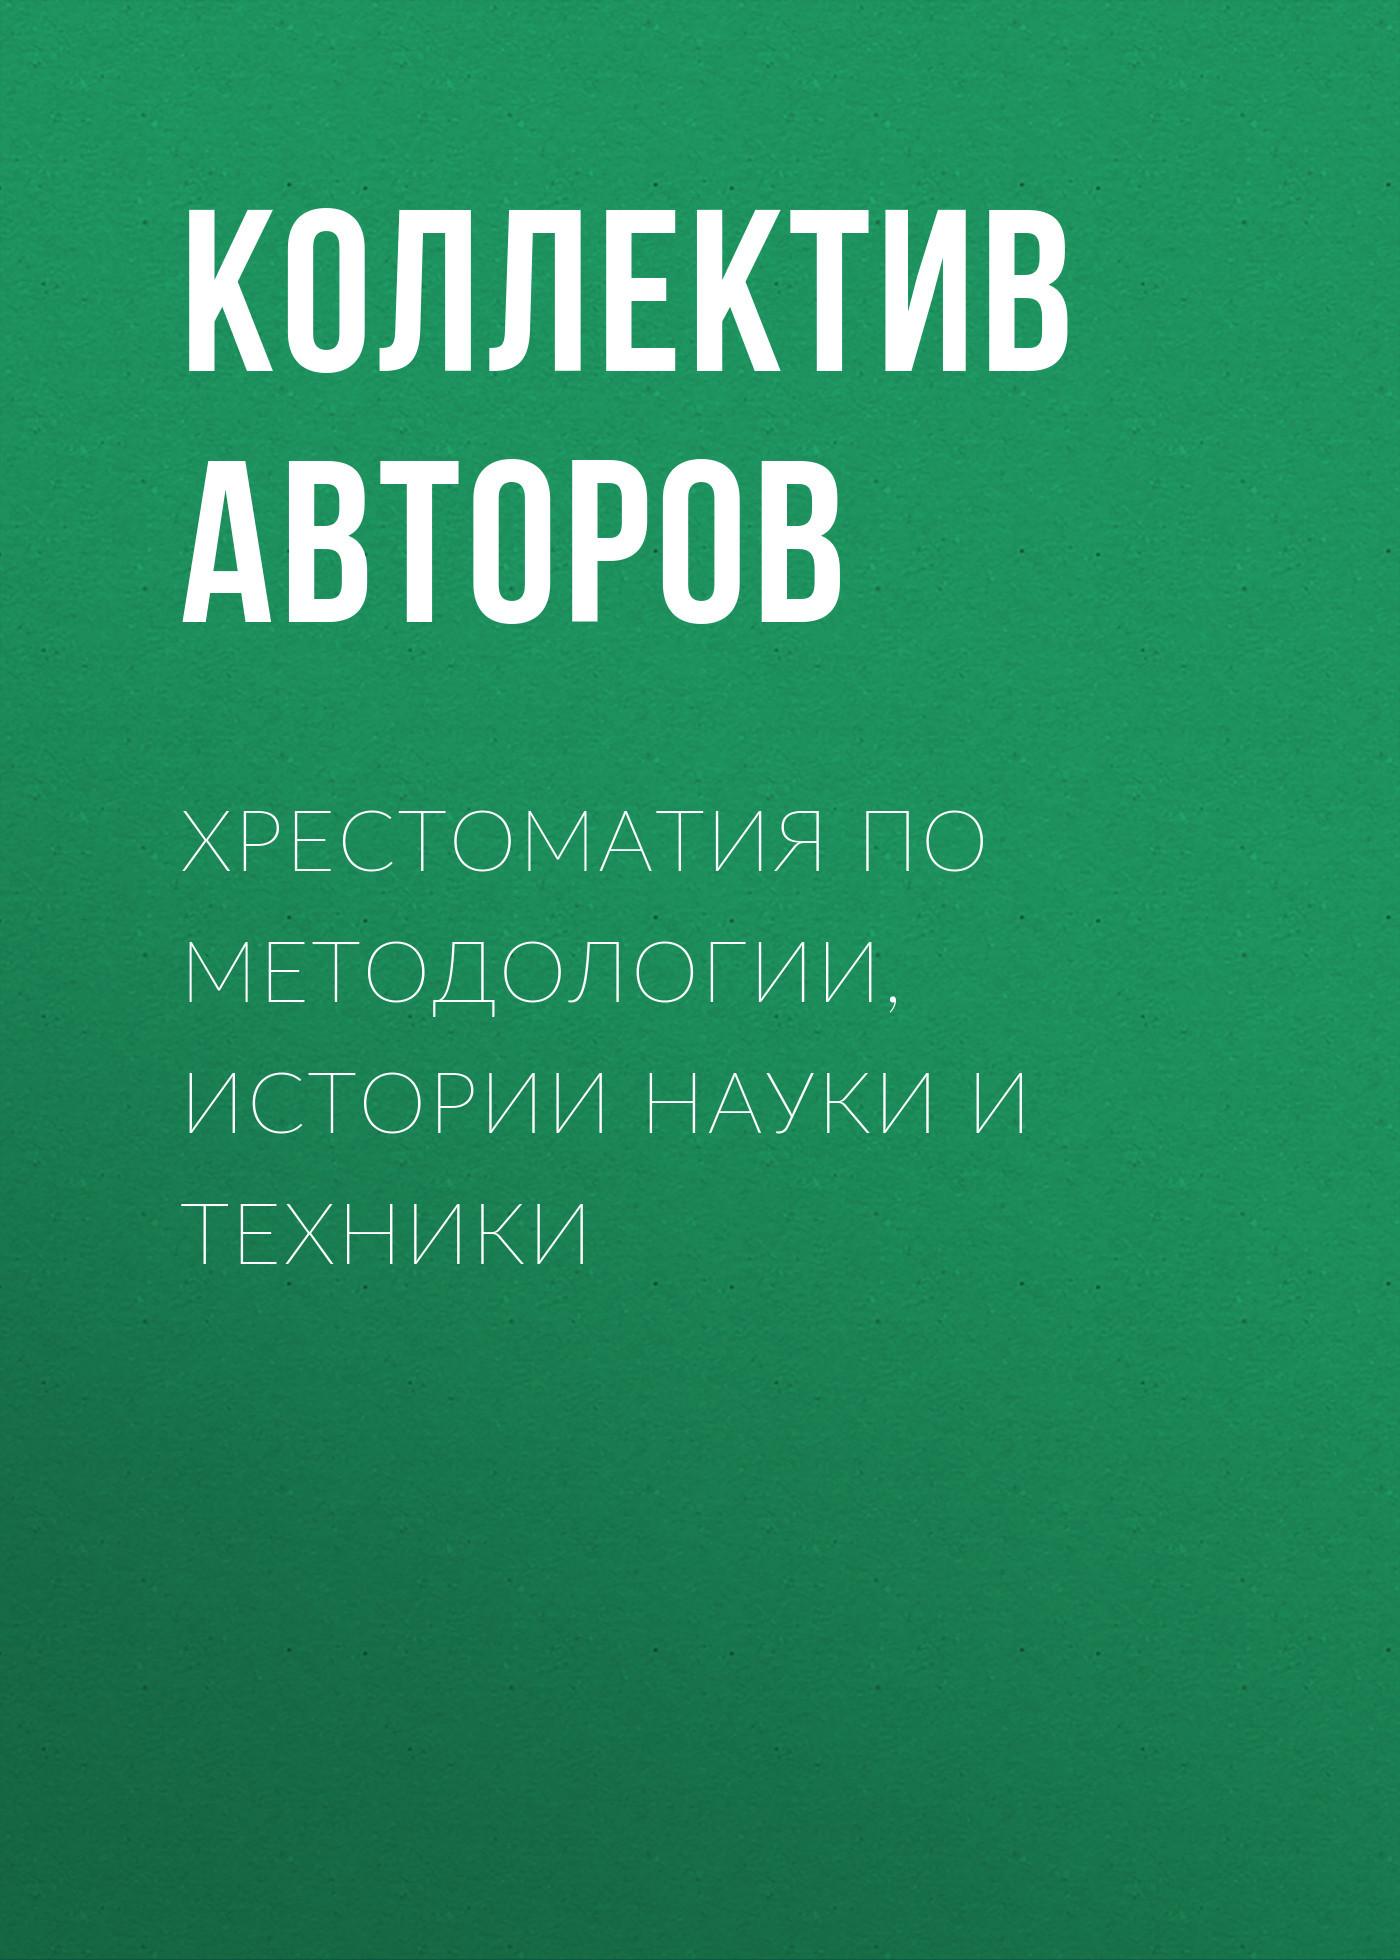 Коллектив авторов Хрестоматия по методологии, истории науки и техники